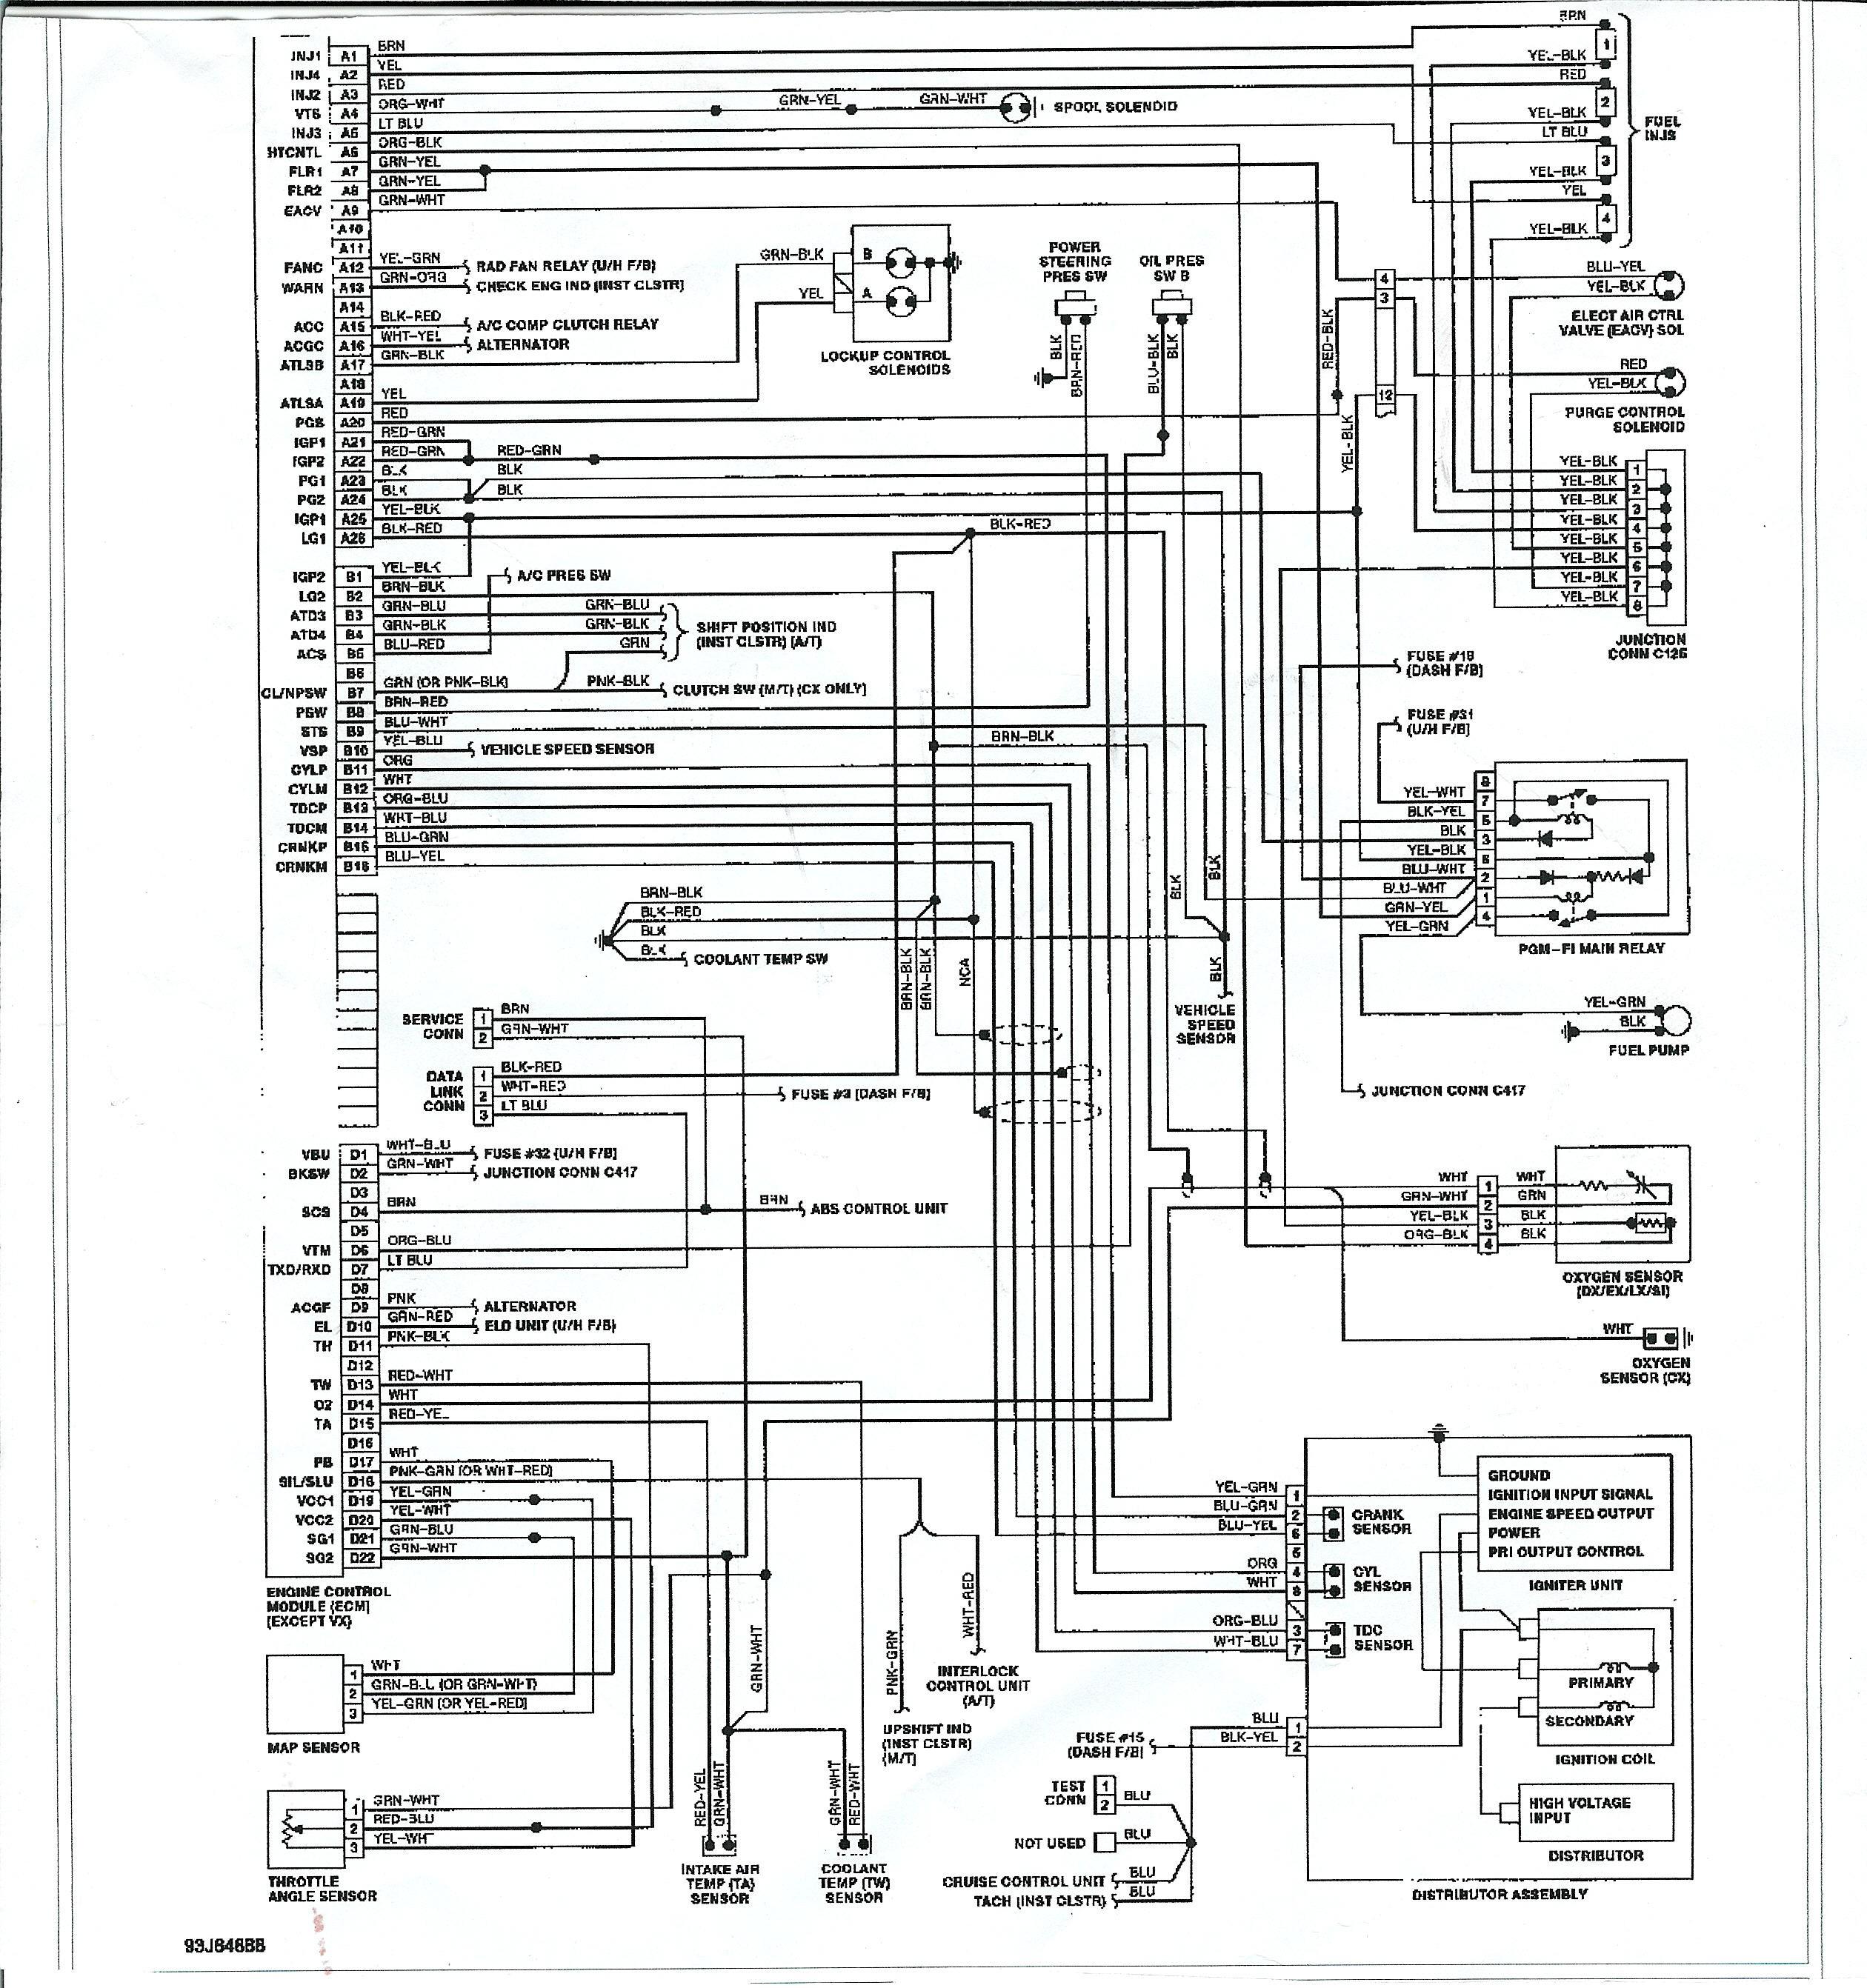 2007 Honda Civic Engine Diagram Vw Transporter Wiring Diagram 95 Honda Civic Transmission Diagram Of 2007 Honda Civic Engine Diagram